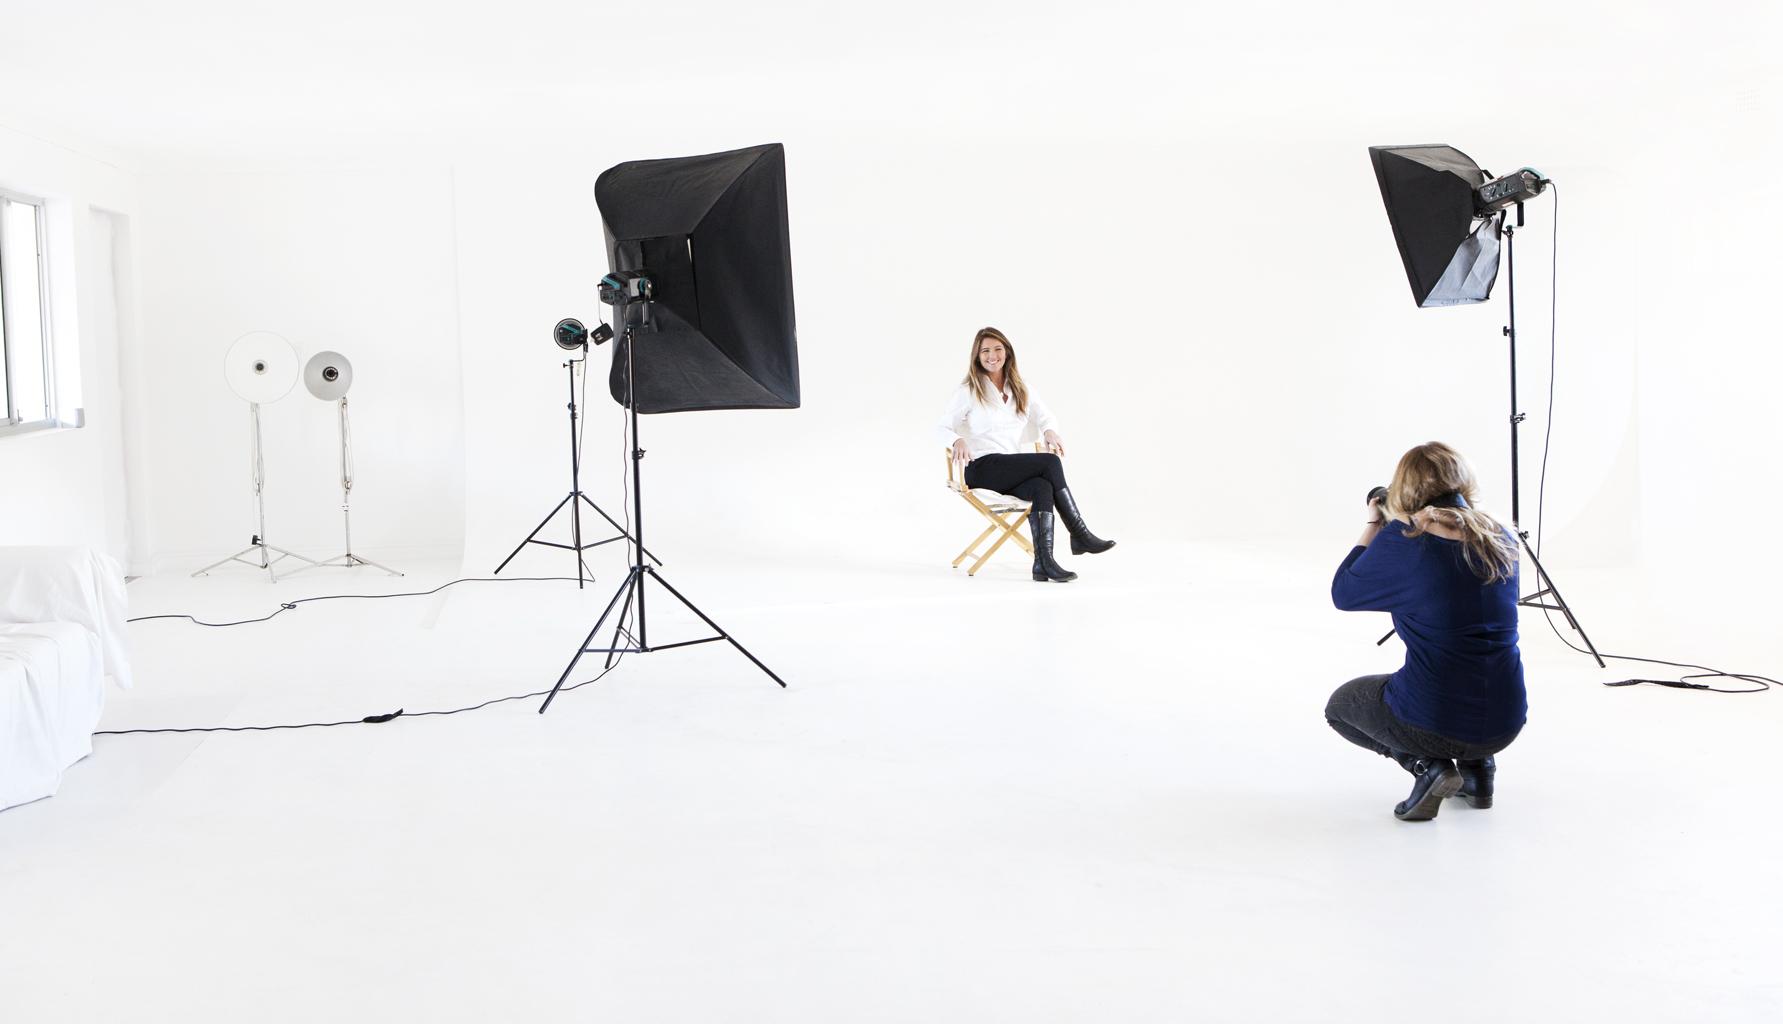 Cara behind the lens